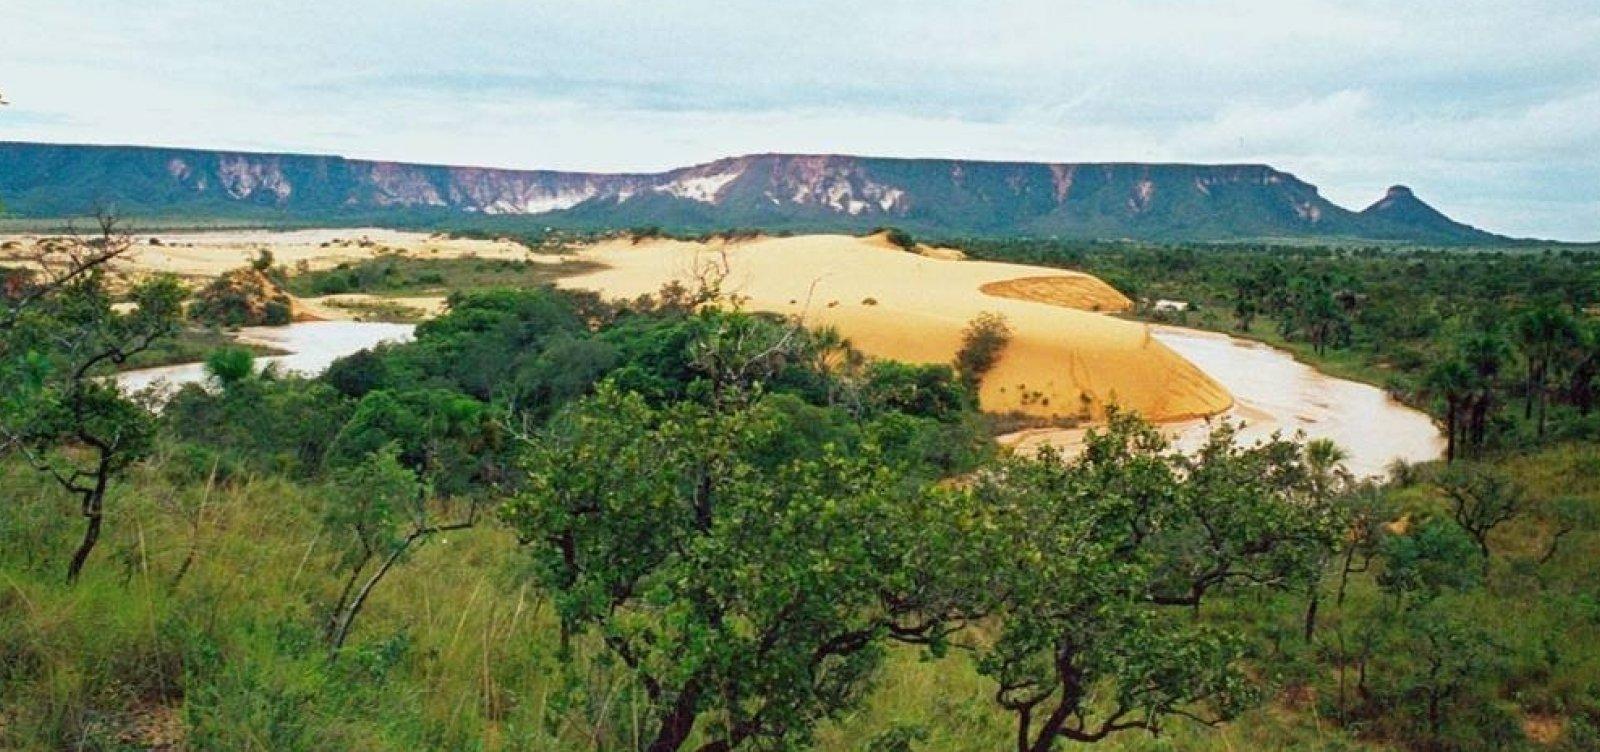 [Governo sinaliza que reenviará ao Congresso medida que altera Código Florestal]